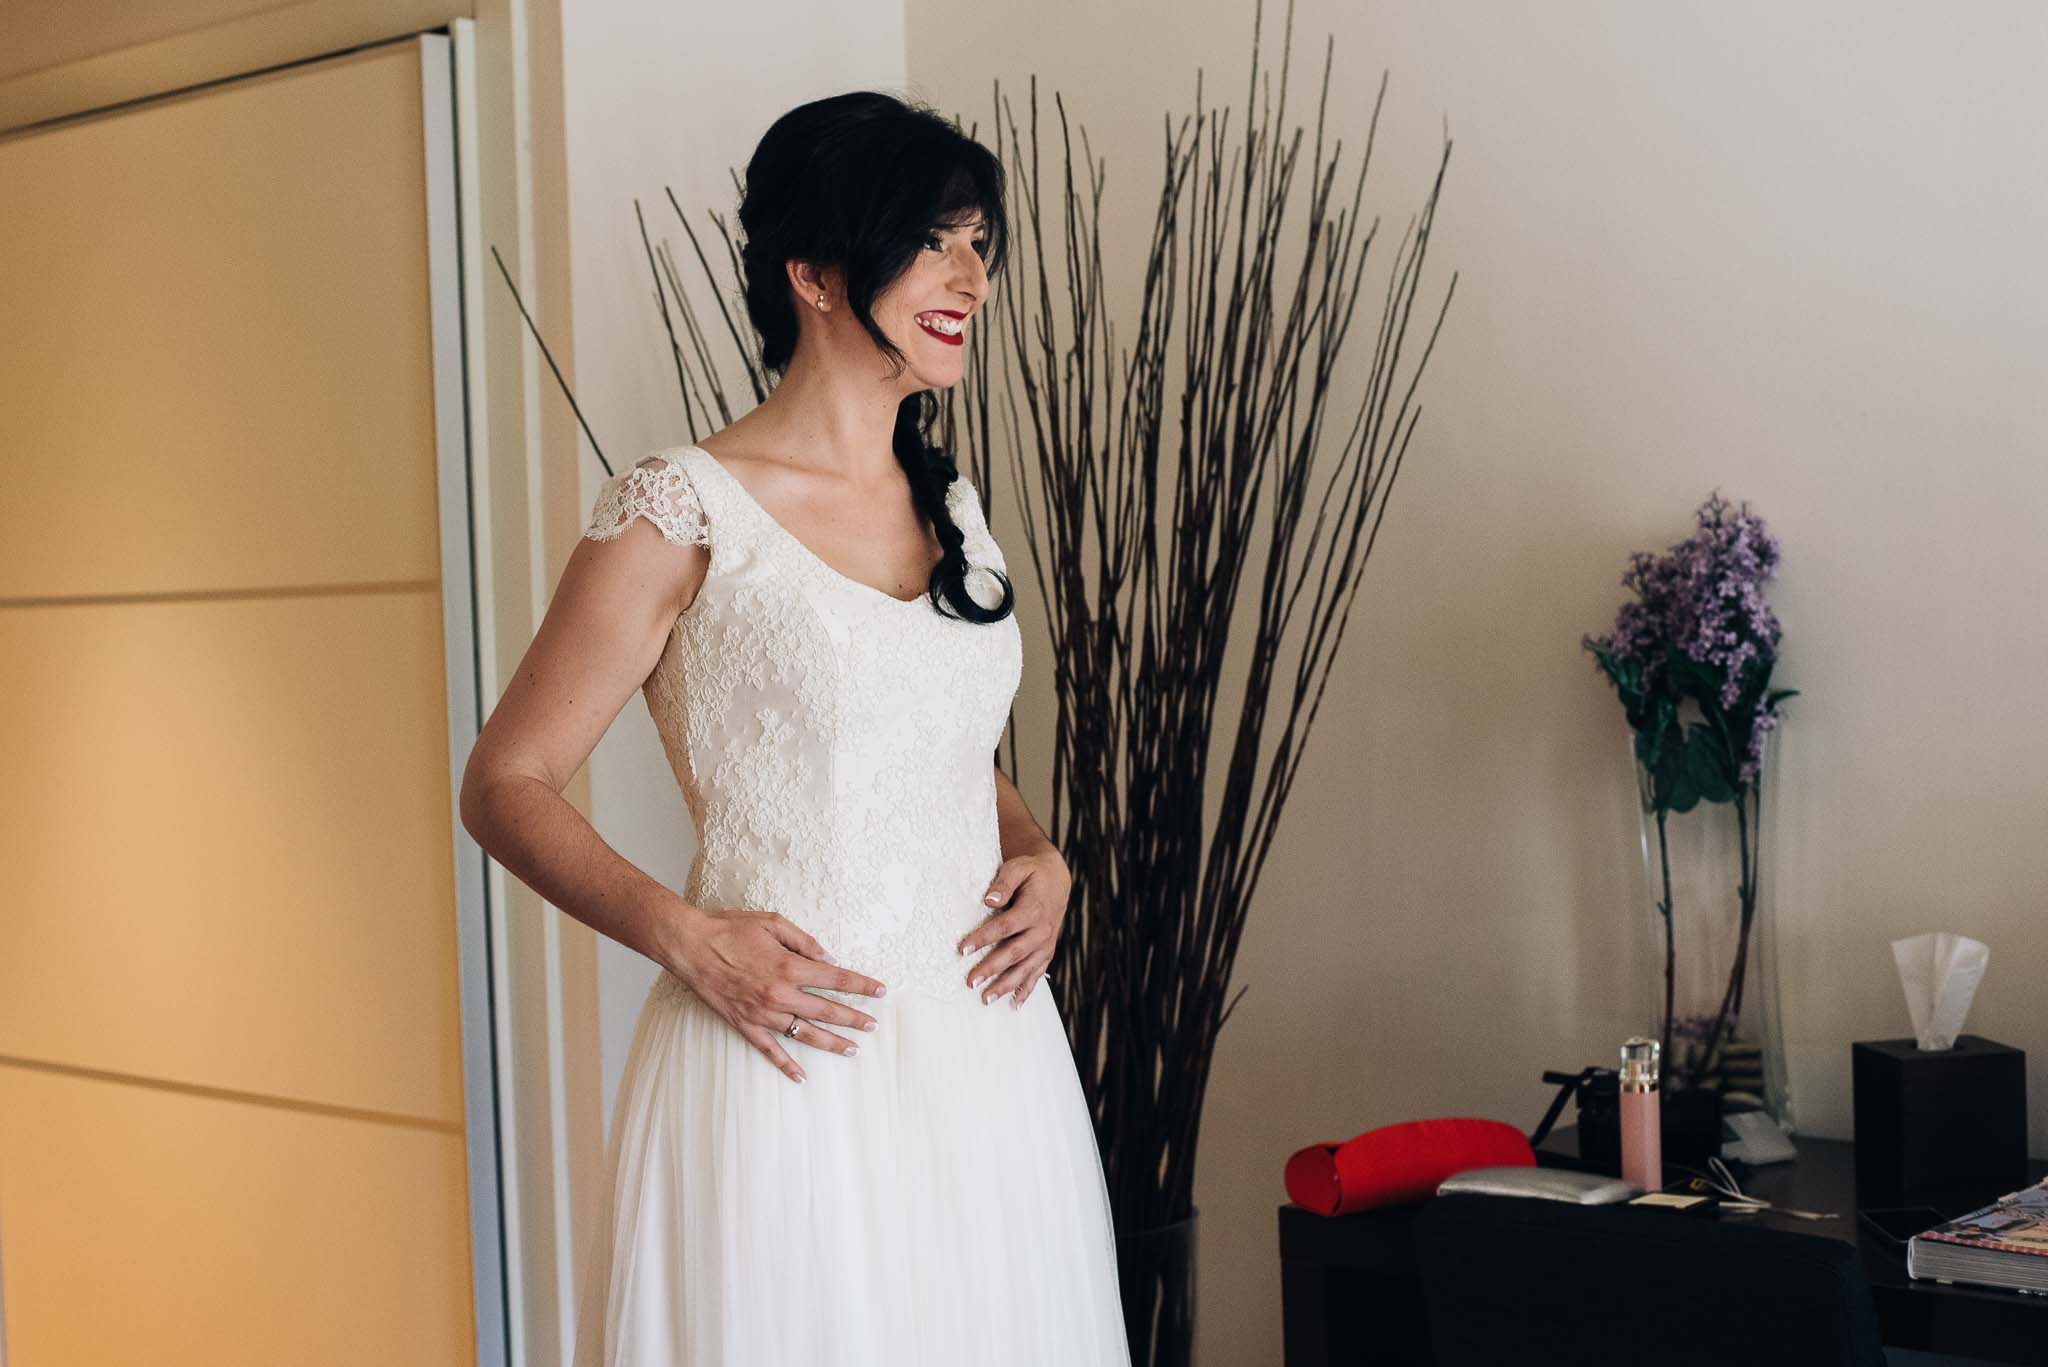 fotoperiodismo-laura-arroyo-fotografia-de-boda-hotel-qgat-san-cugat-barcelona-28